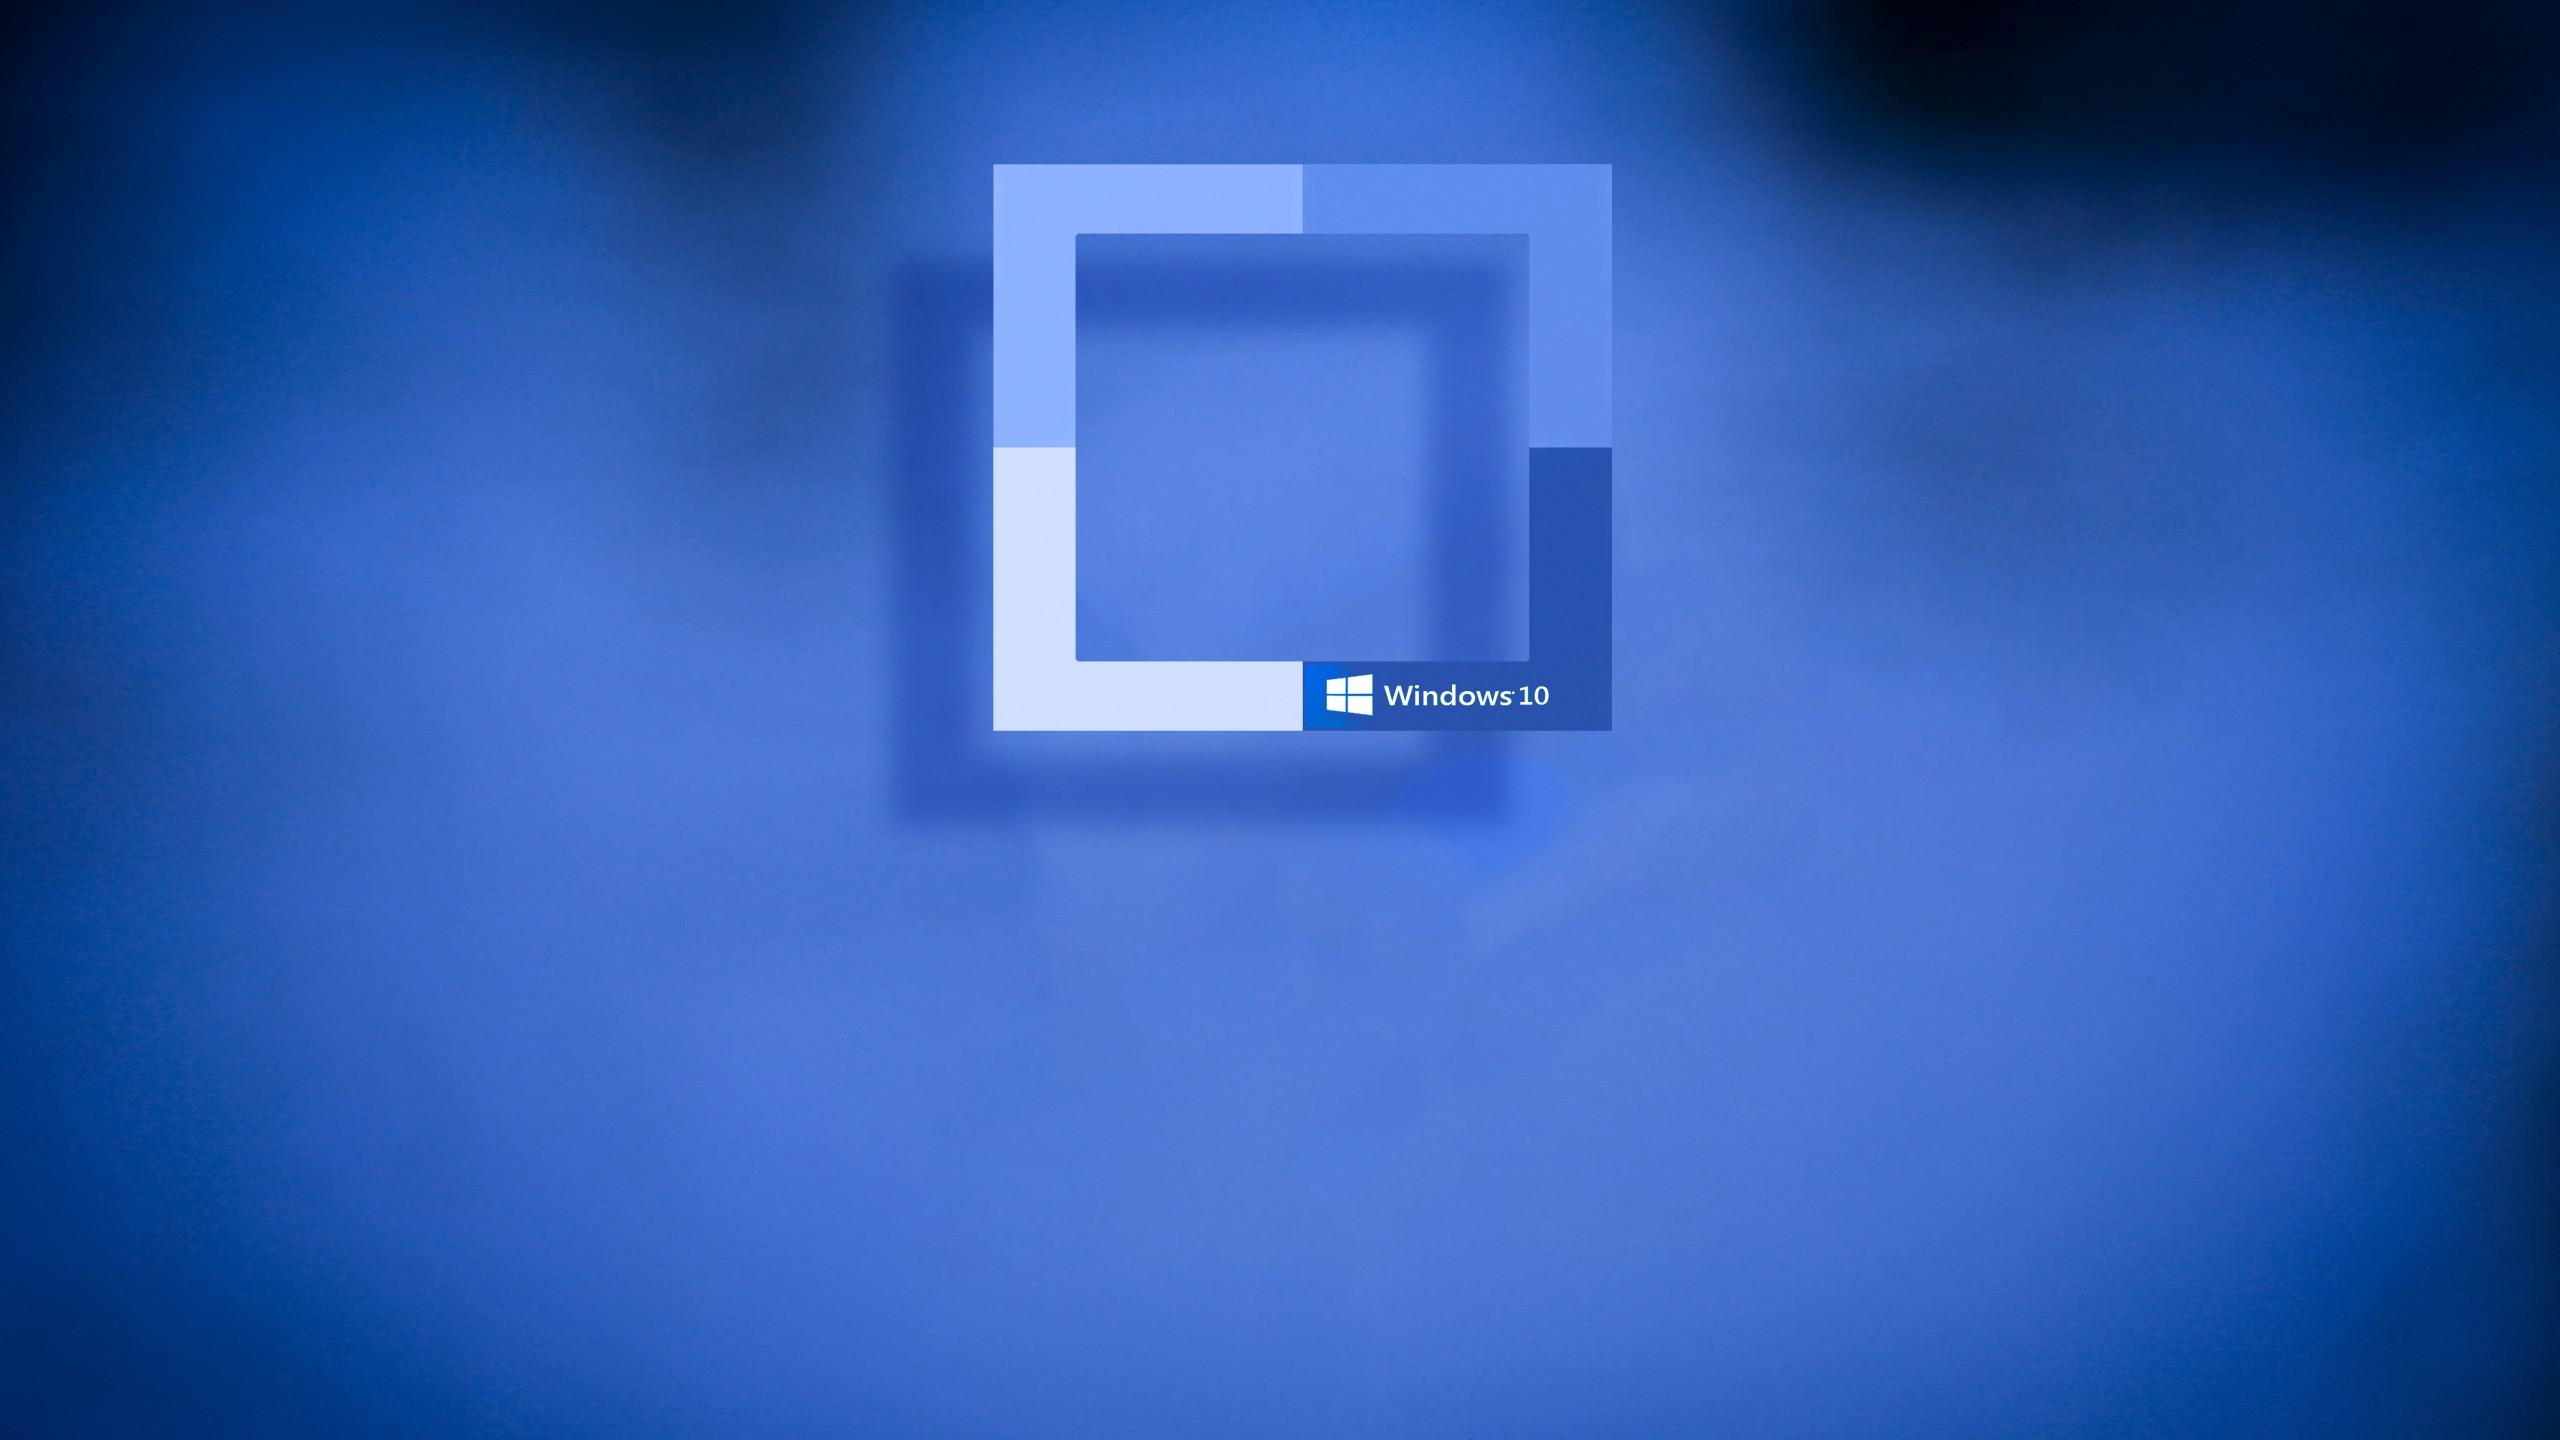 Windows 10 Wallpapers, Desktop Backgrounds - High Resolution Windows 10 Background - HD Wallpaper